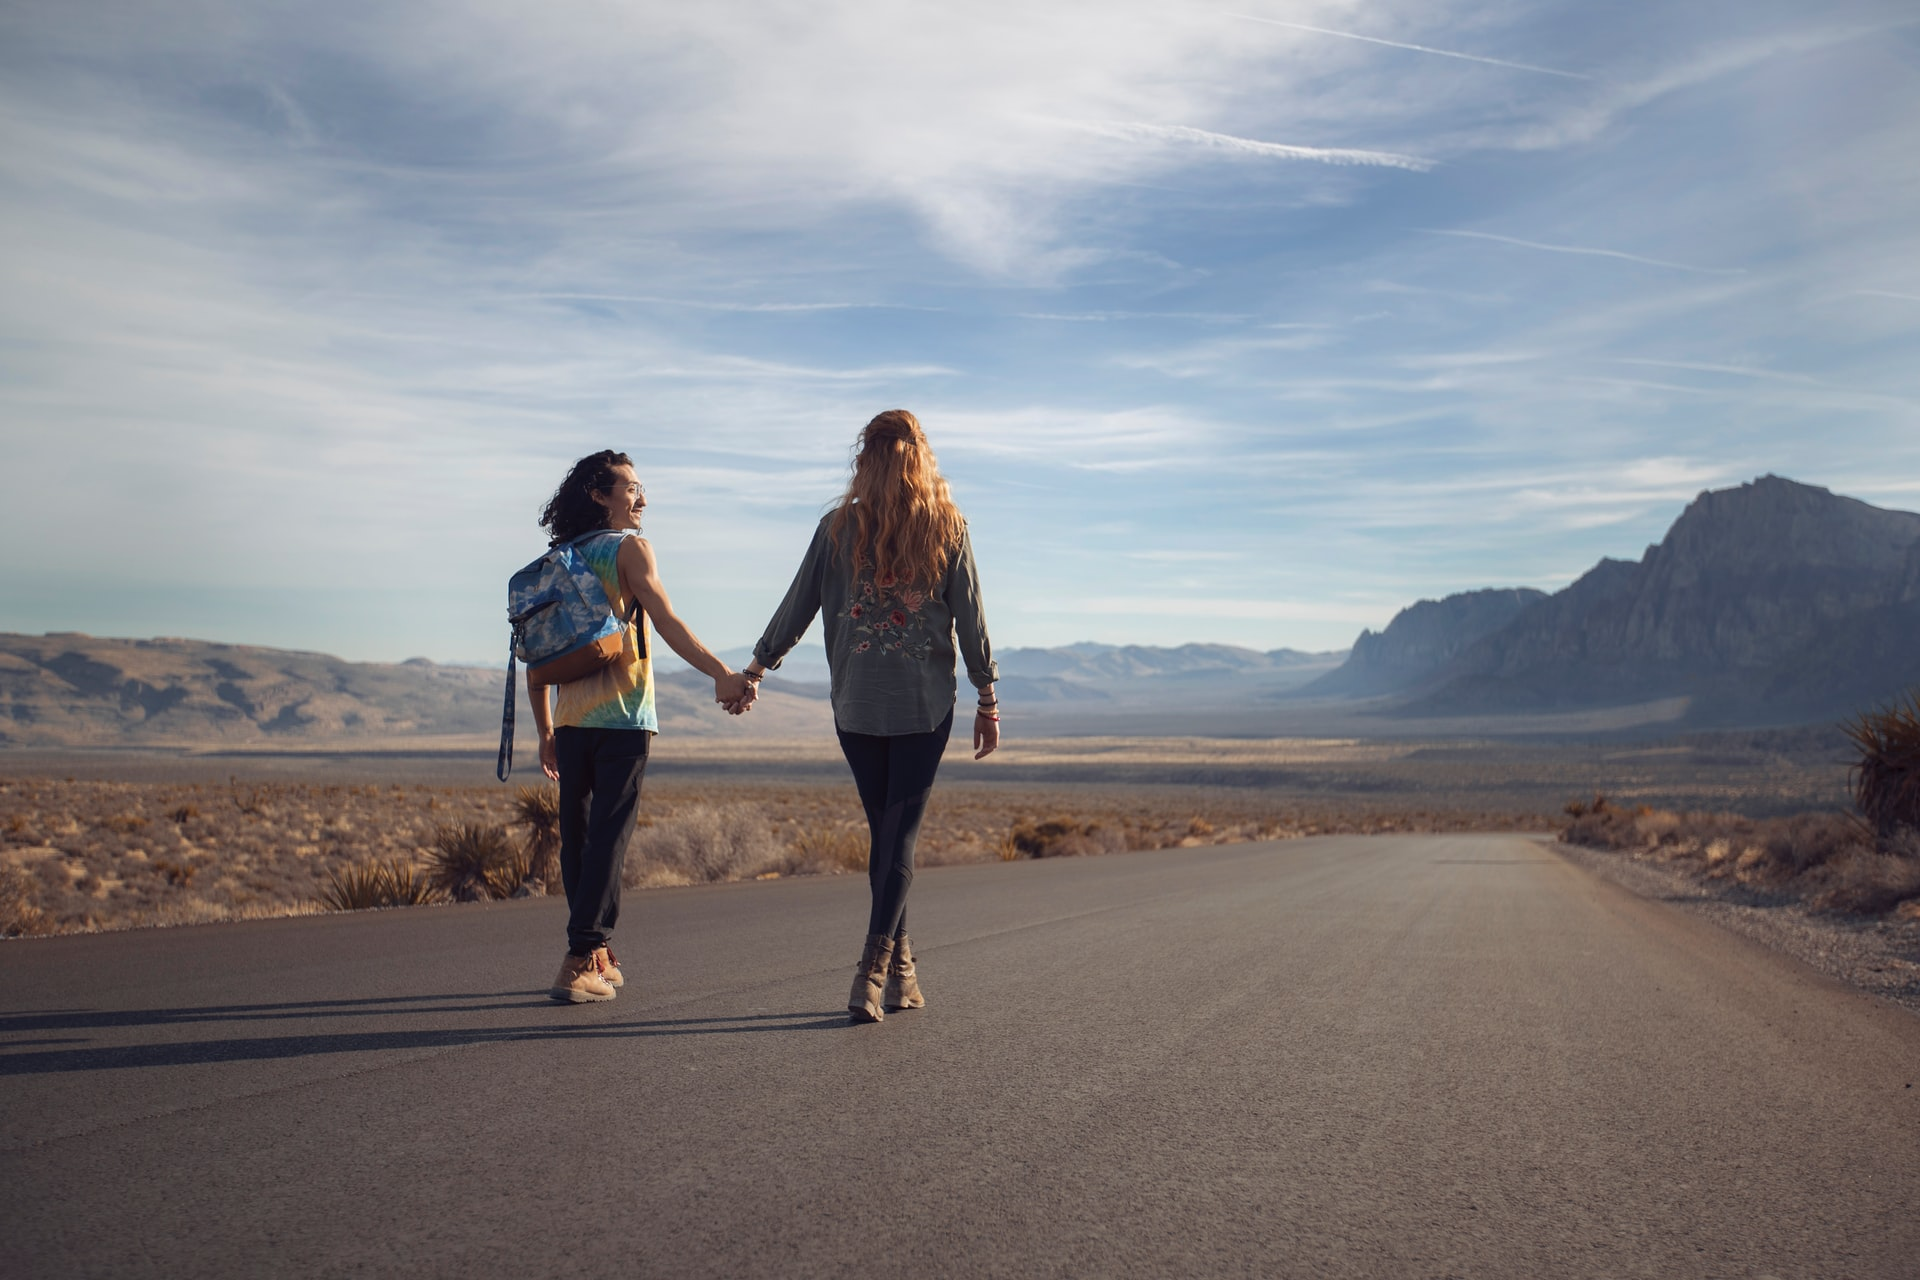 non-teaching spouses traveling internationally